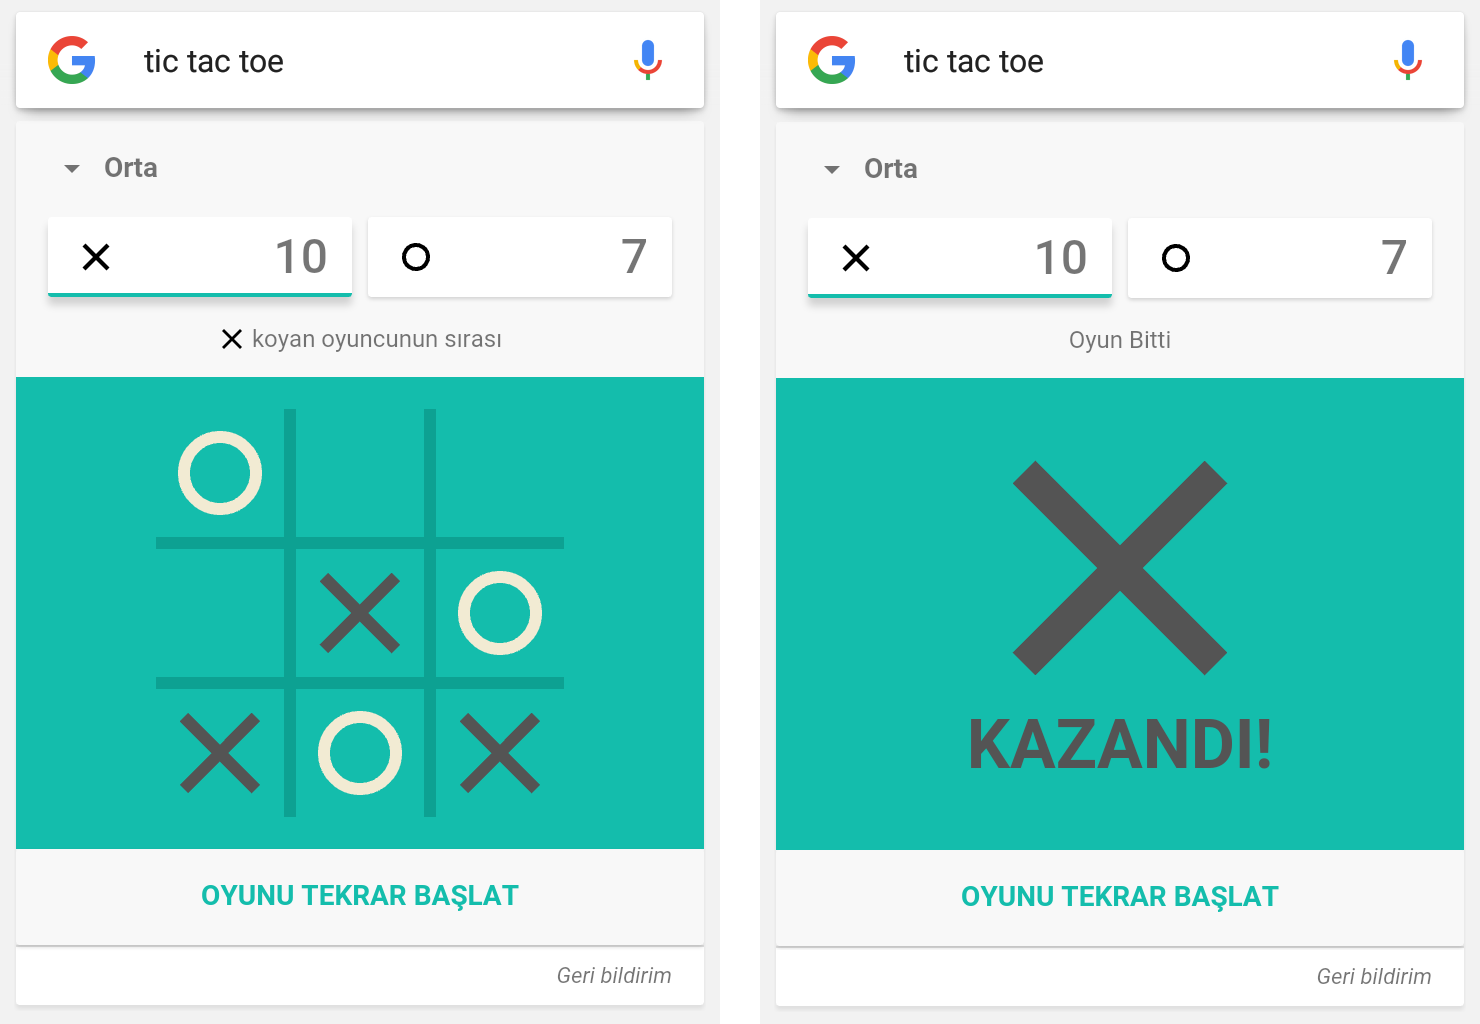 Google Tic-Tac-Toe